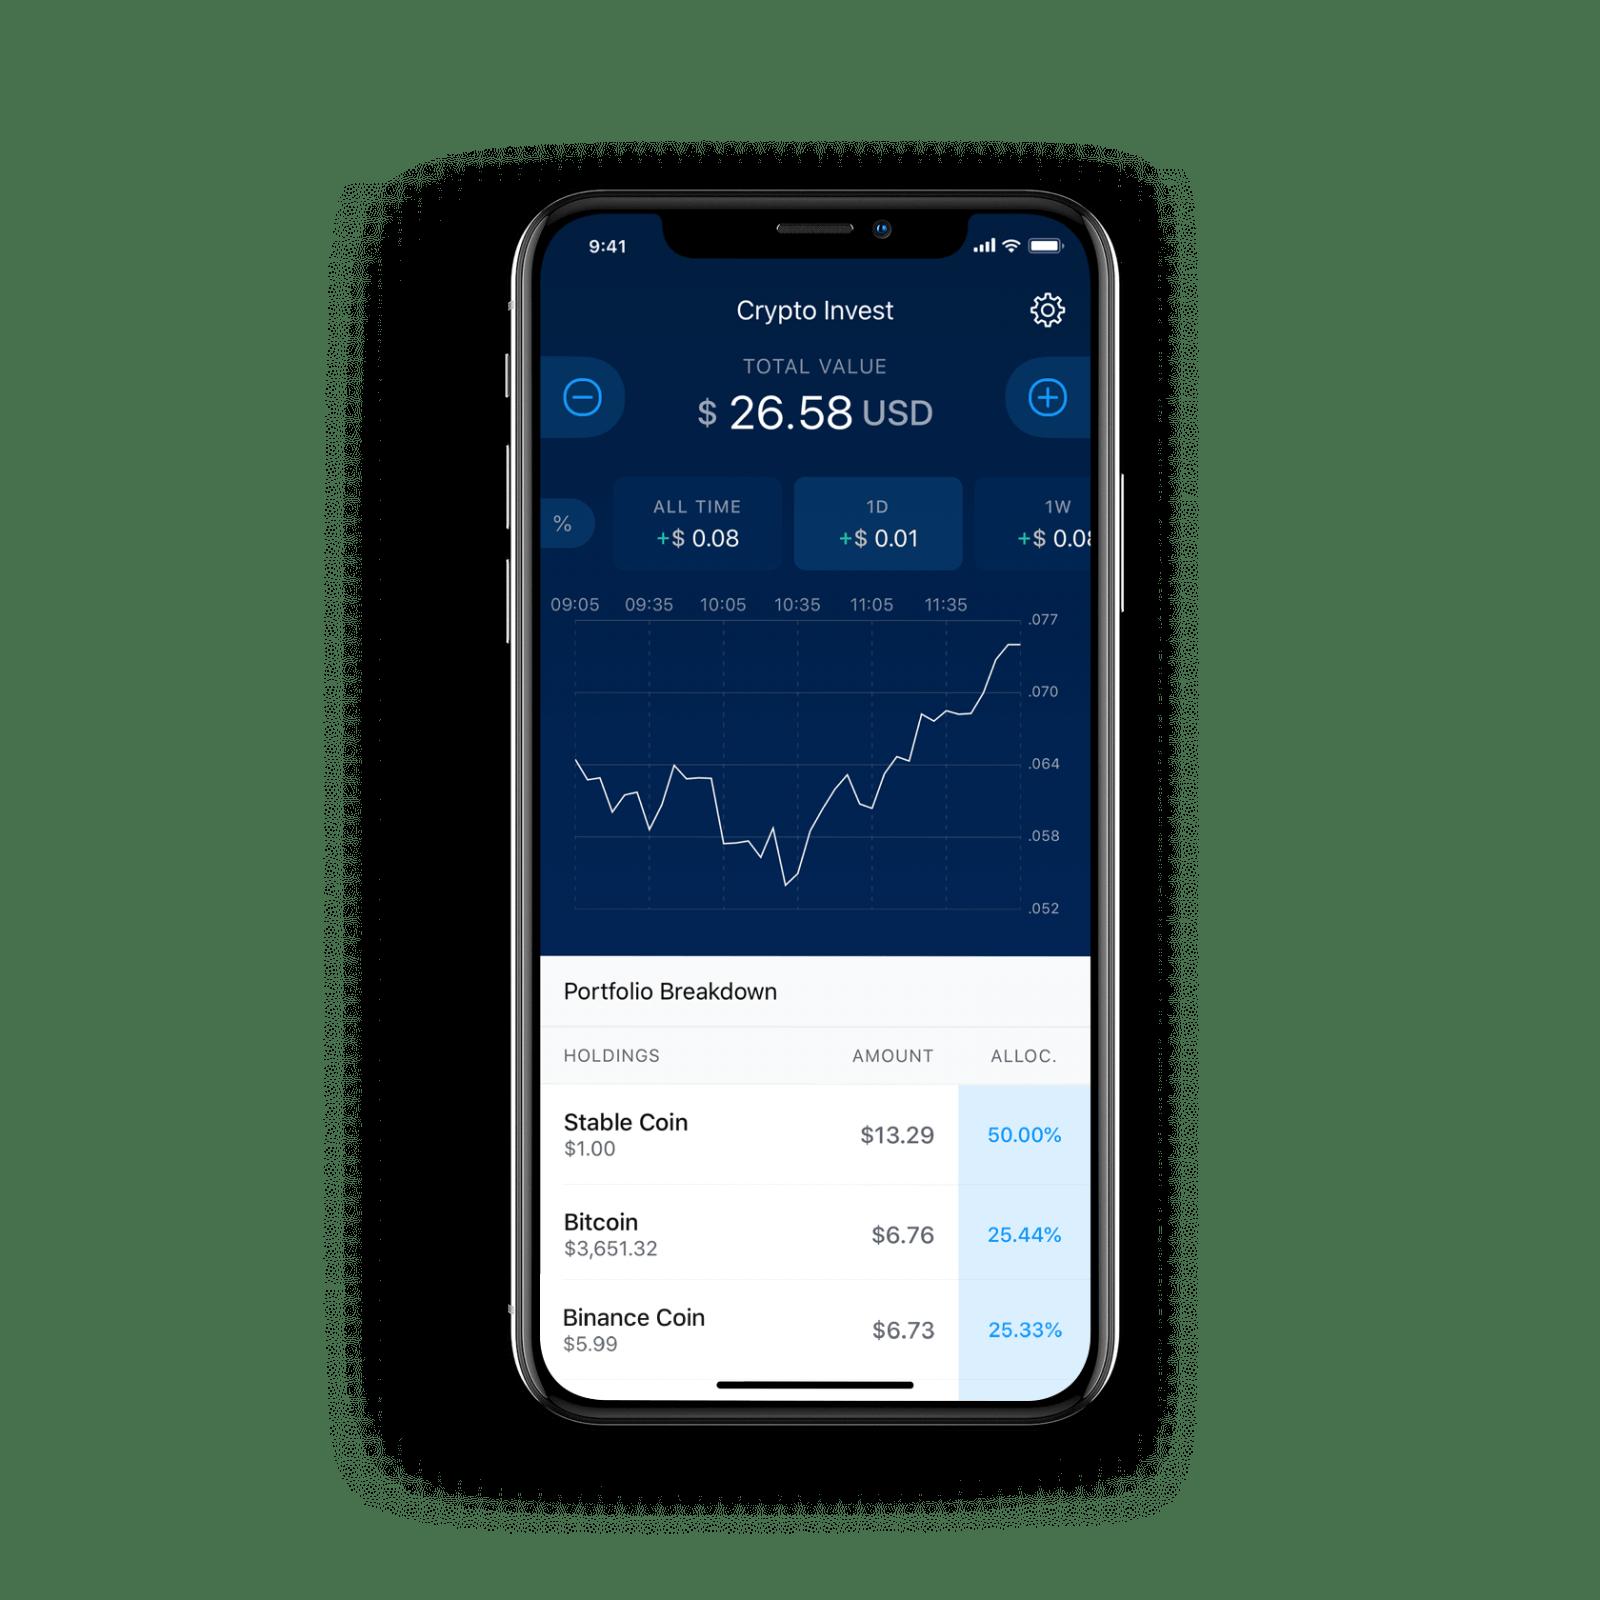 MCO - CB VISA PLATINUM (Gratuite) - Plateforme d'investissement simplifié